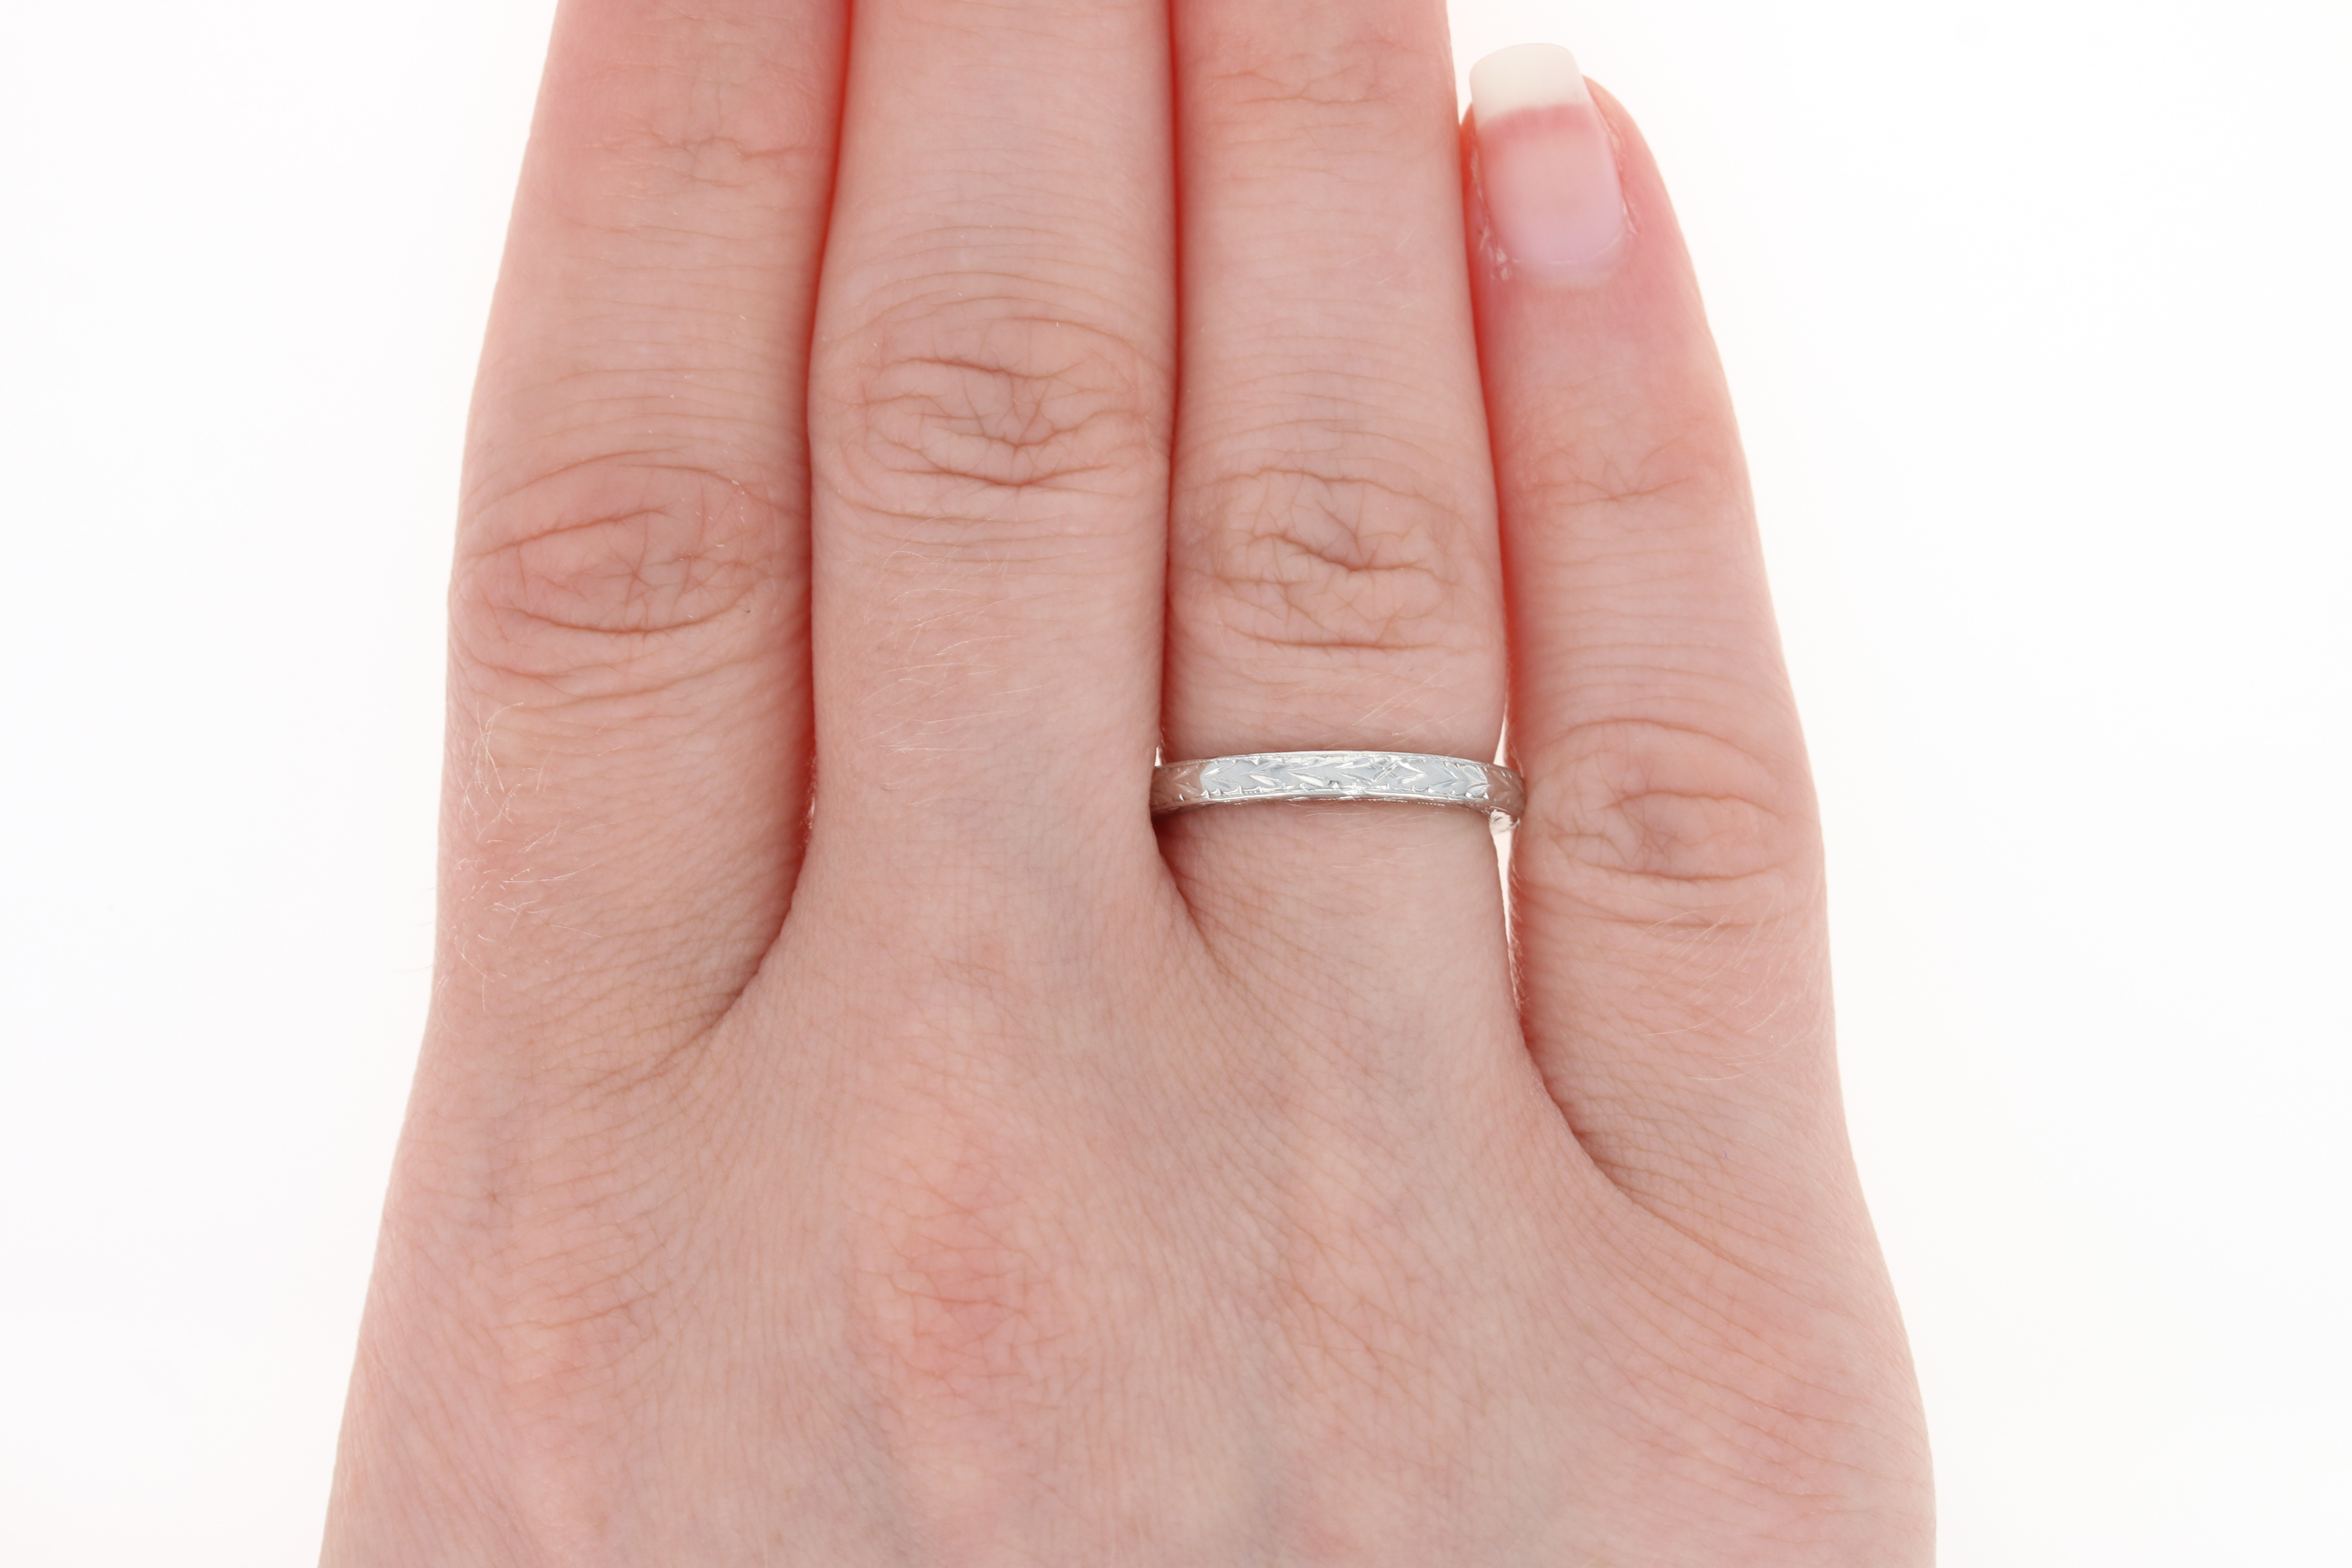 Etched Wedding Band - 950 Platinum Women\'s Ring Size 5 3/4 - 6   eBay